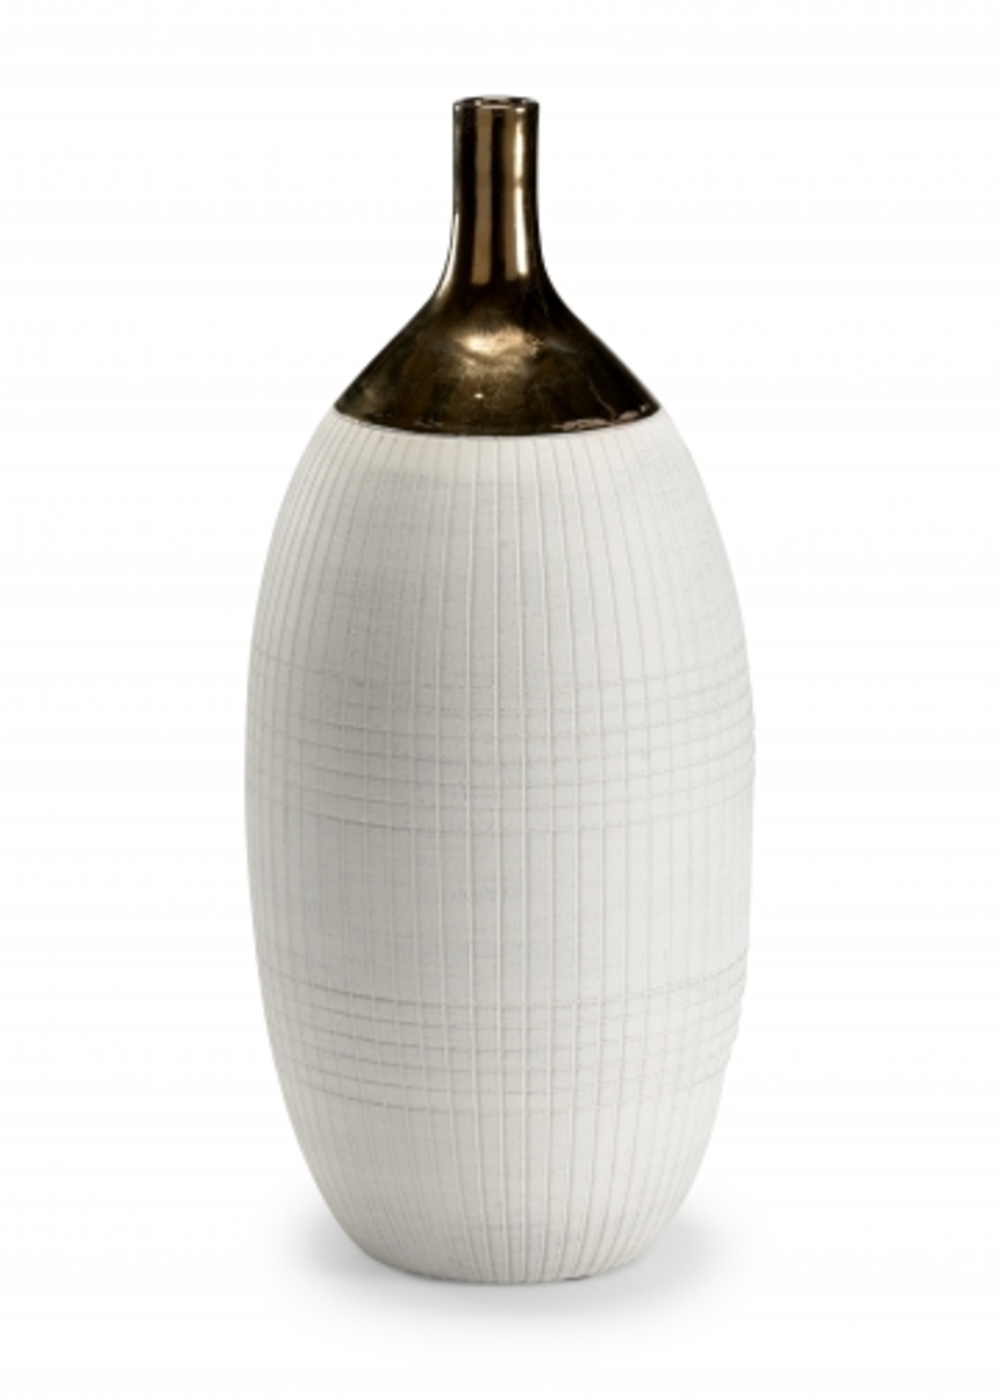 Wildwood Lamp - Blanco Potters Vase